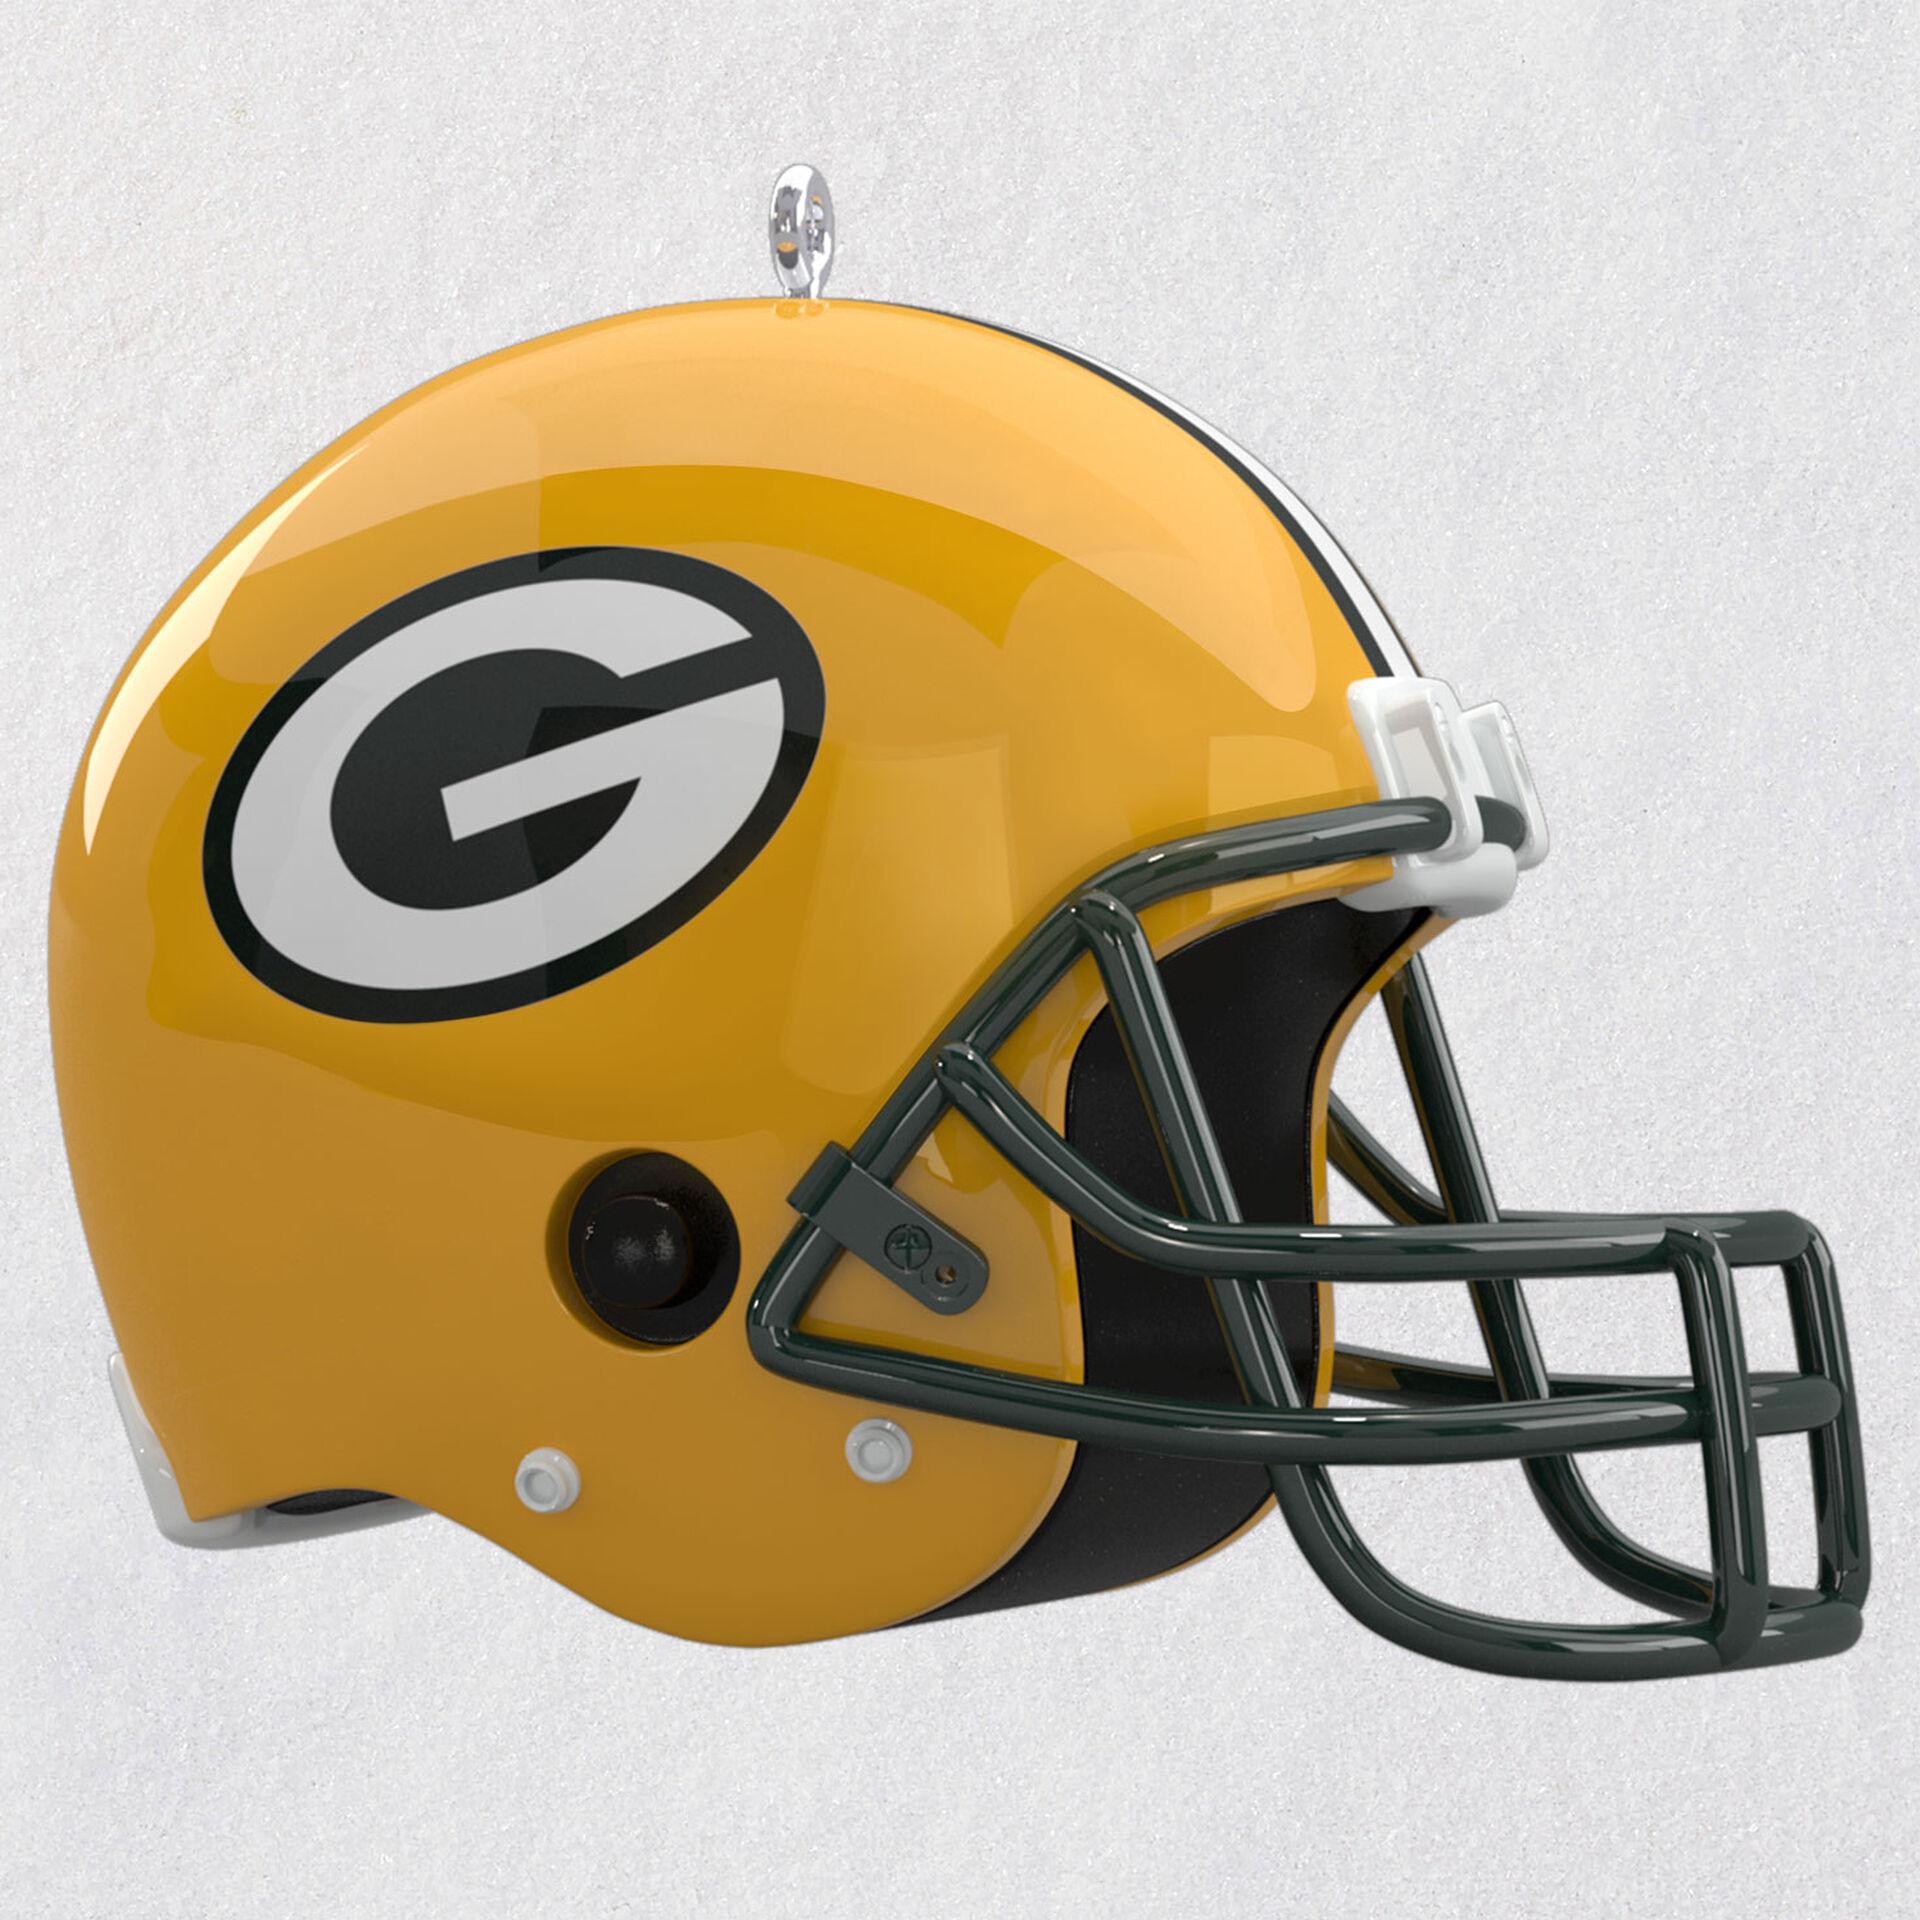 Nfl Green Bay Packers Helmet Ornament With Sound Keepsake Ornaments Hallmark